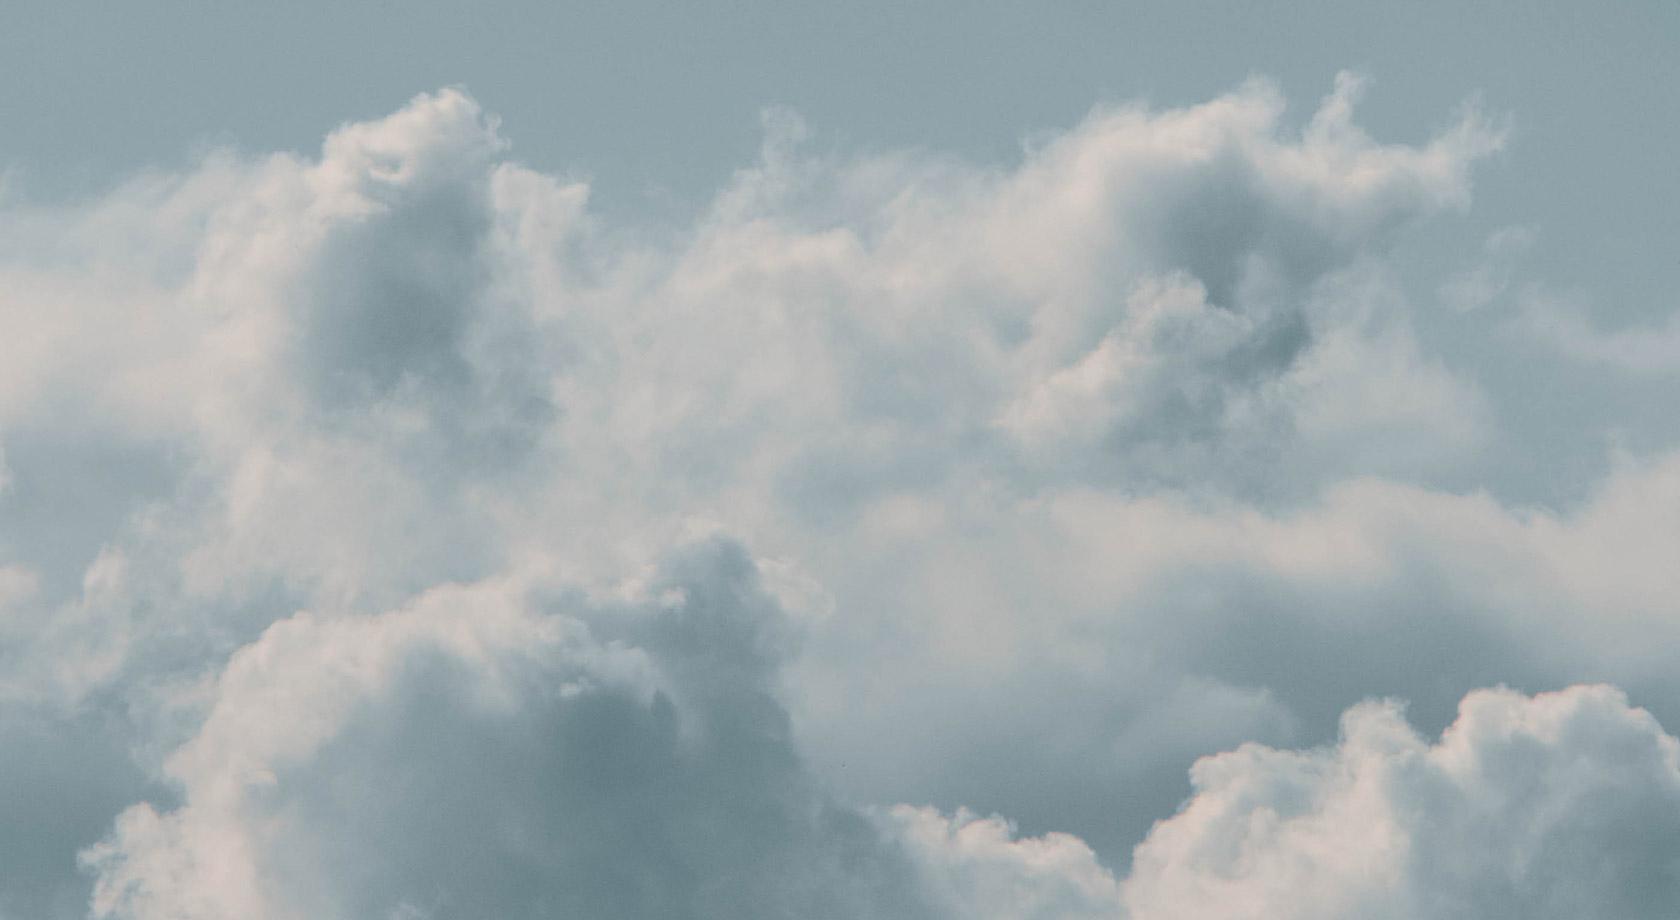 Sleep - clouds